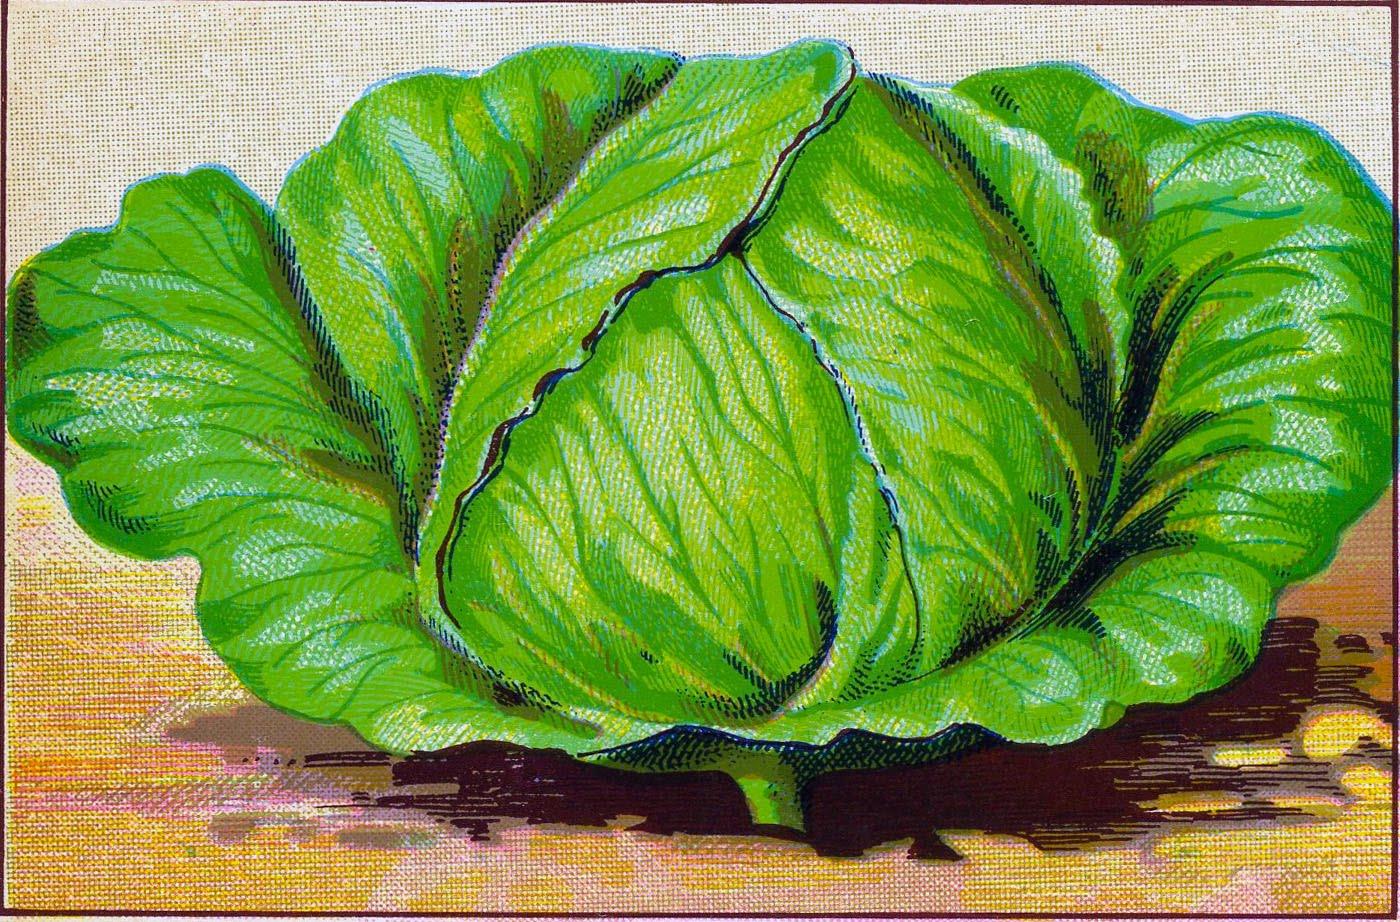 Vintage vegetable clipart color picture transparent download 50 Best Free Gardening Images - The Graphics Fairy picture transparent download